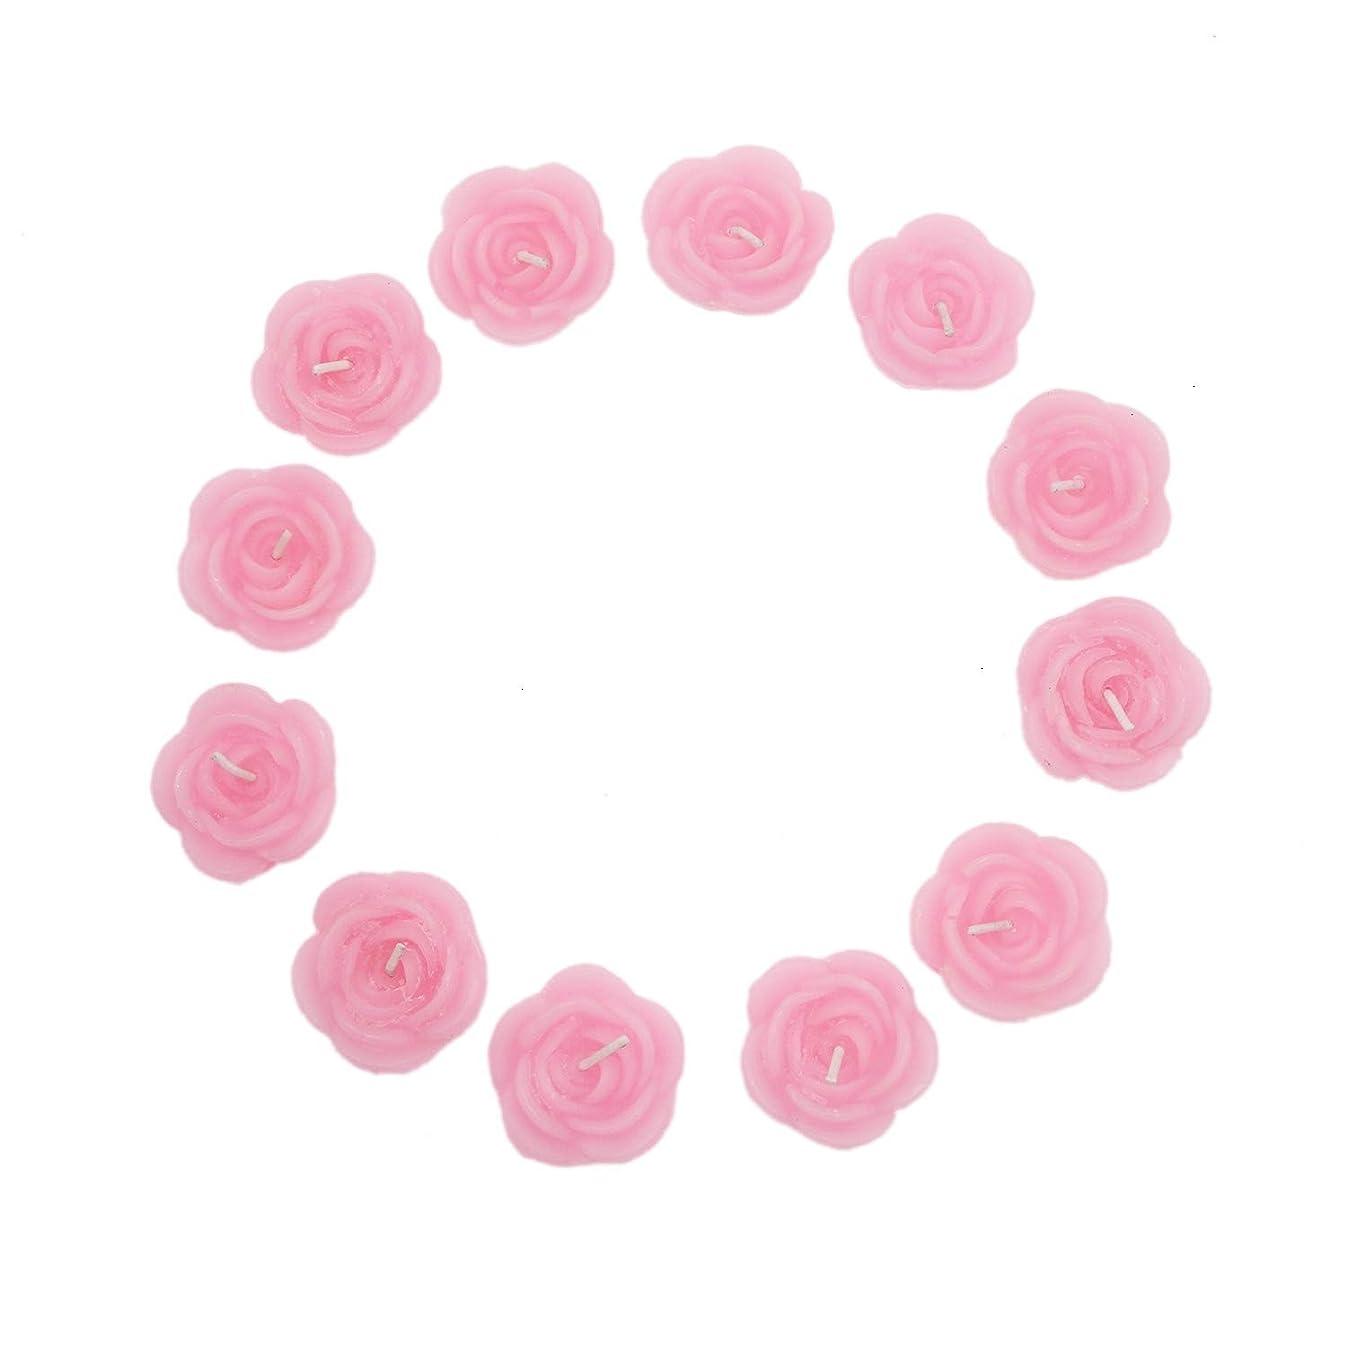 Buorsa 12 Pcs Pink Rose-Shaped Floating Candles